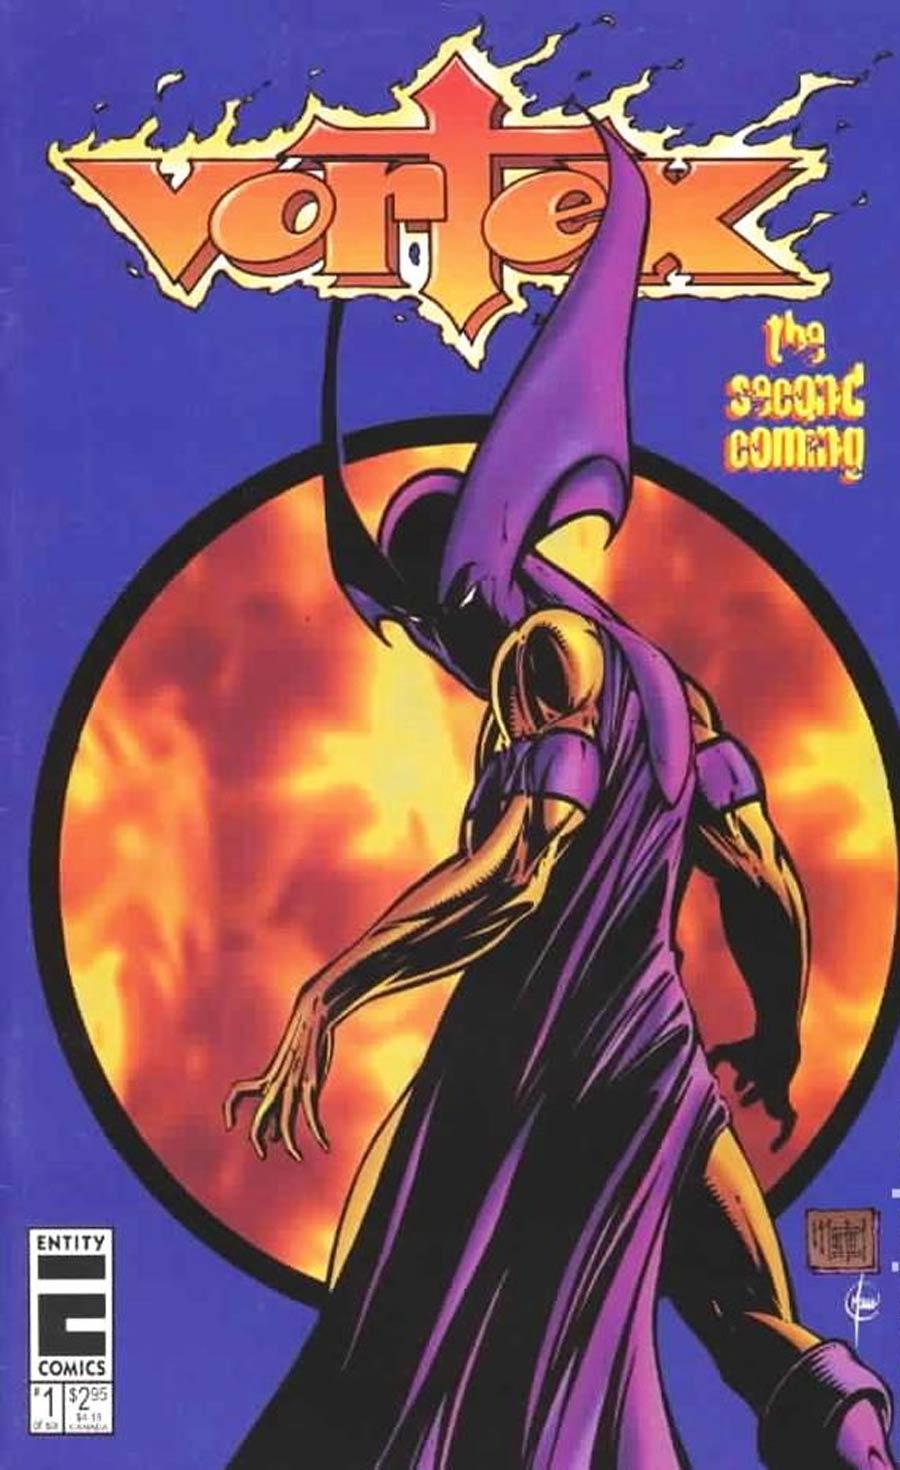 Vortex (Entity) #1 Cover B